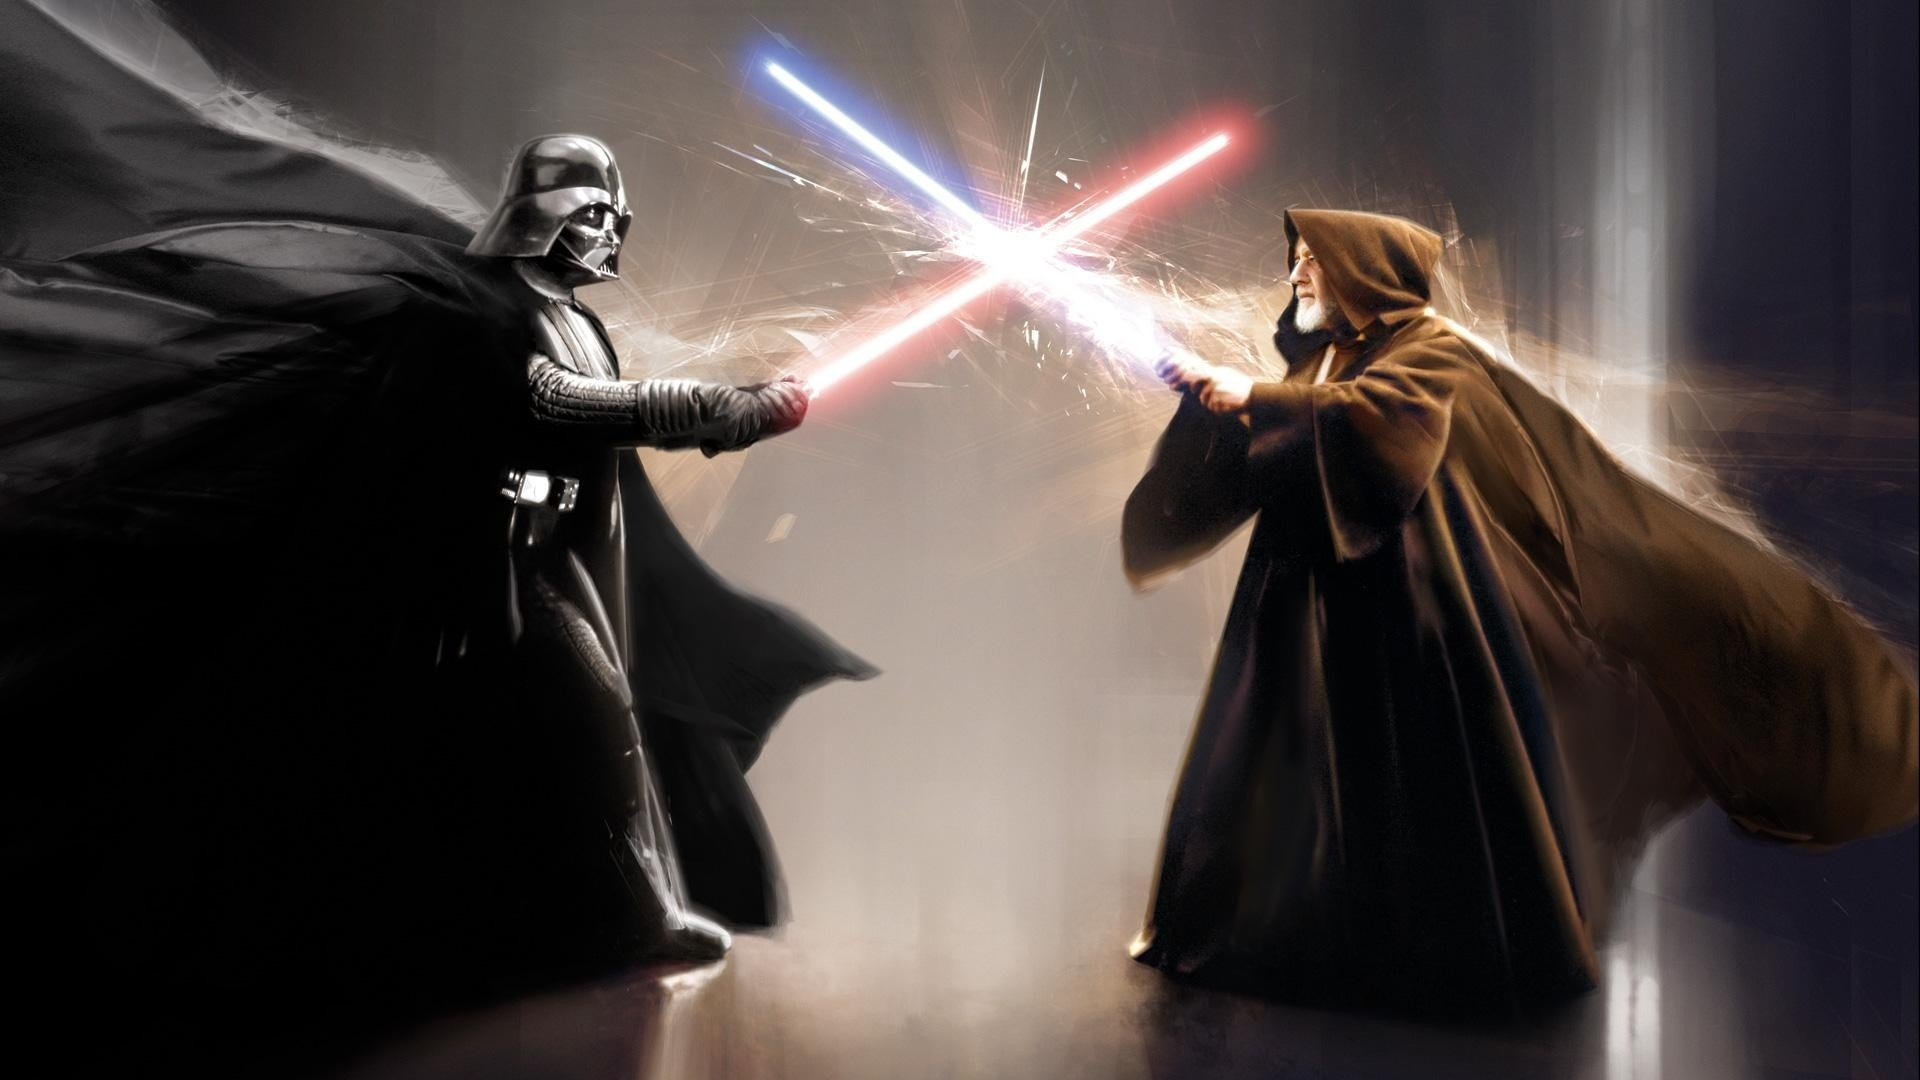 Darth Vader Obi Wan Kenobi movies star wars sci fi weapons lightsaber 1920x1080